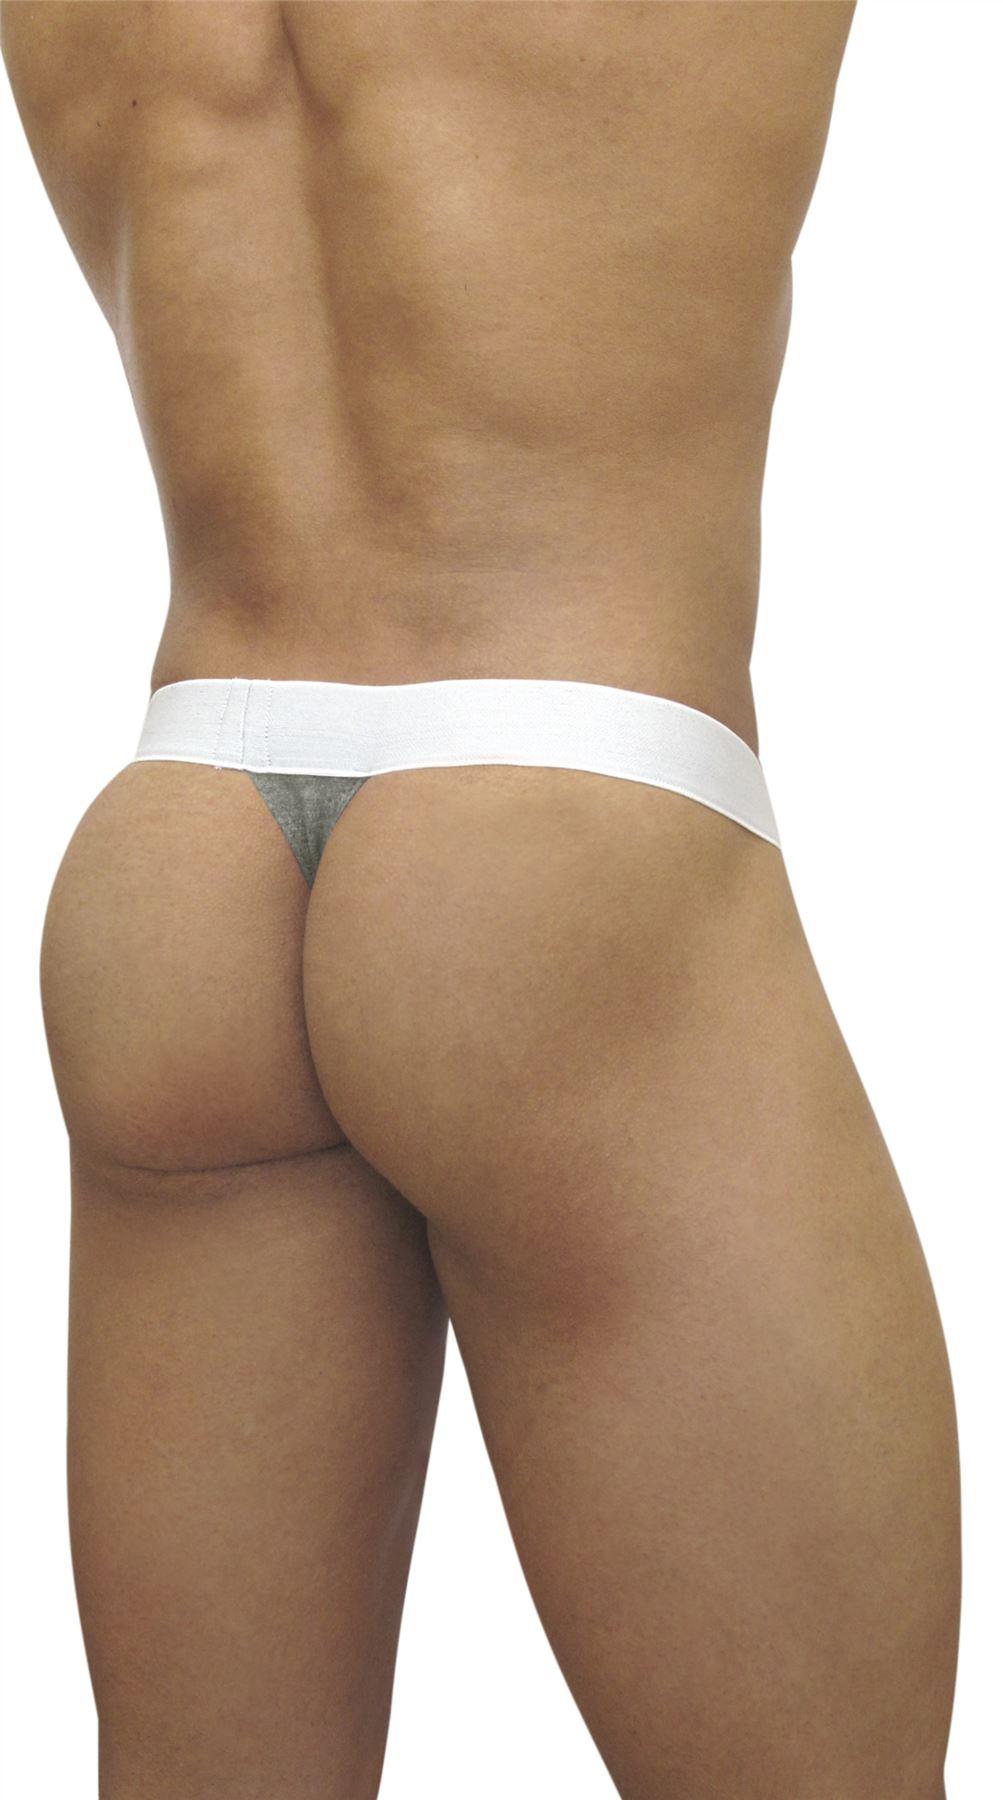 Ergowear MAX Modal Thong men/'s underwear string male tanga slip brief enhancing